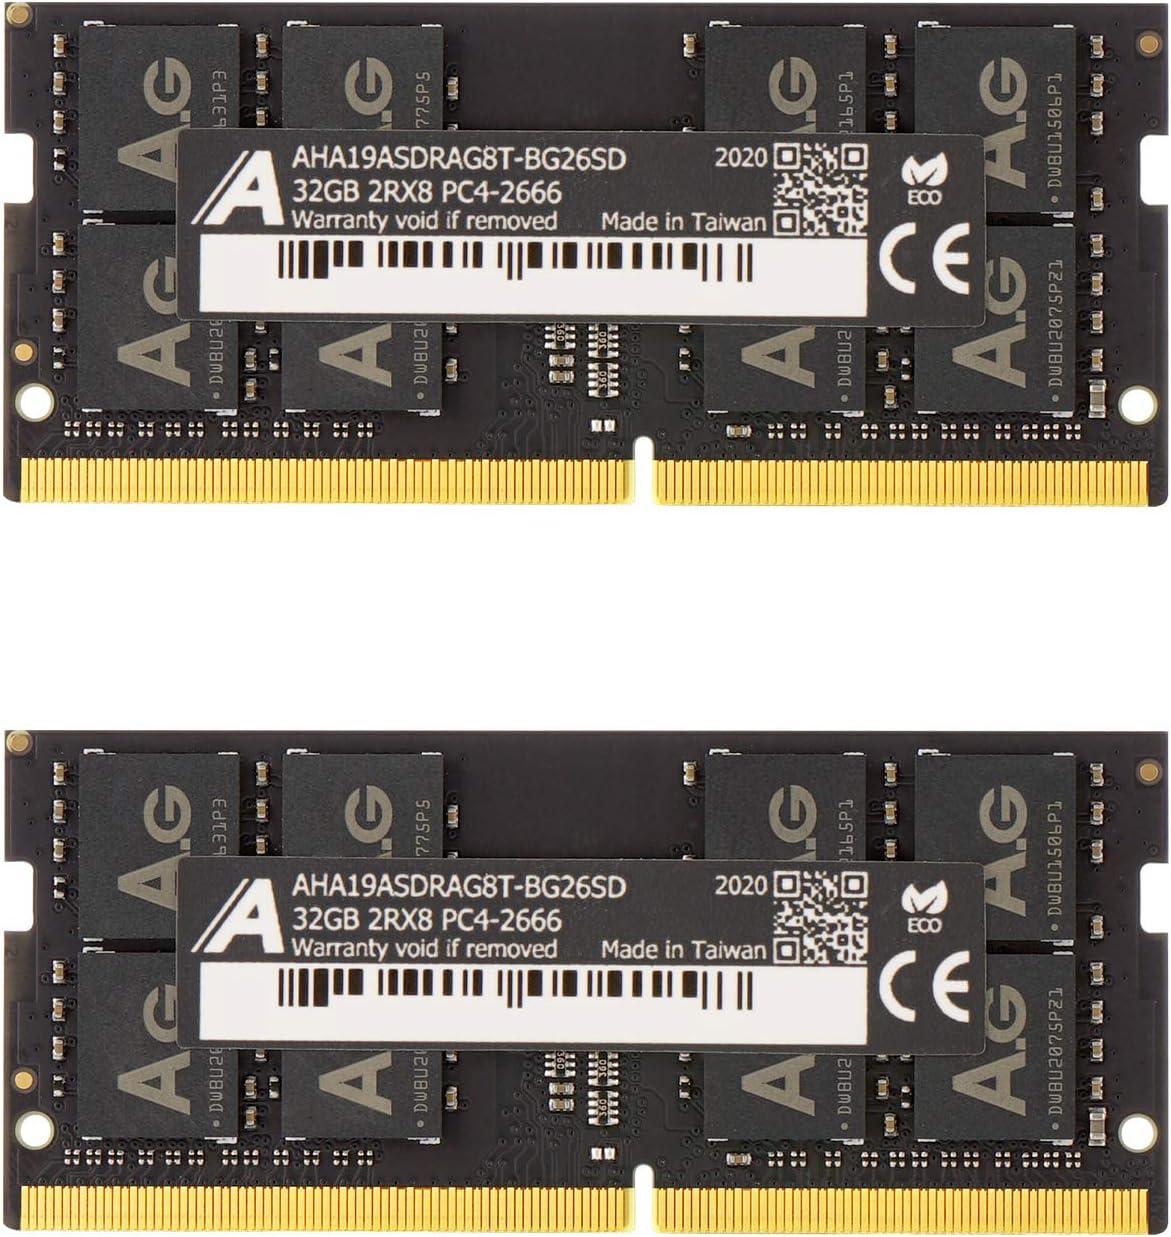 "Astra Gear 64GB (2 x32GB) Upgrade for 2020 Apple iMac 27"" w/Retina 5K Display & 2019 Apple iMac 27-inch w/Retina 5K Display DDR4 Non ECC 2666MHz (PC4-21300) CL19 1.2V SO-DIMM (AHA19ASDRAG8T-BG26SD)"